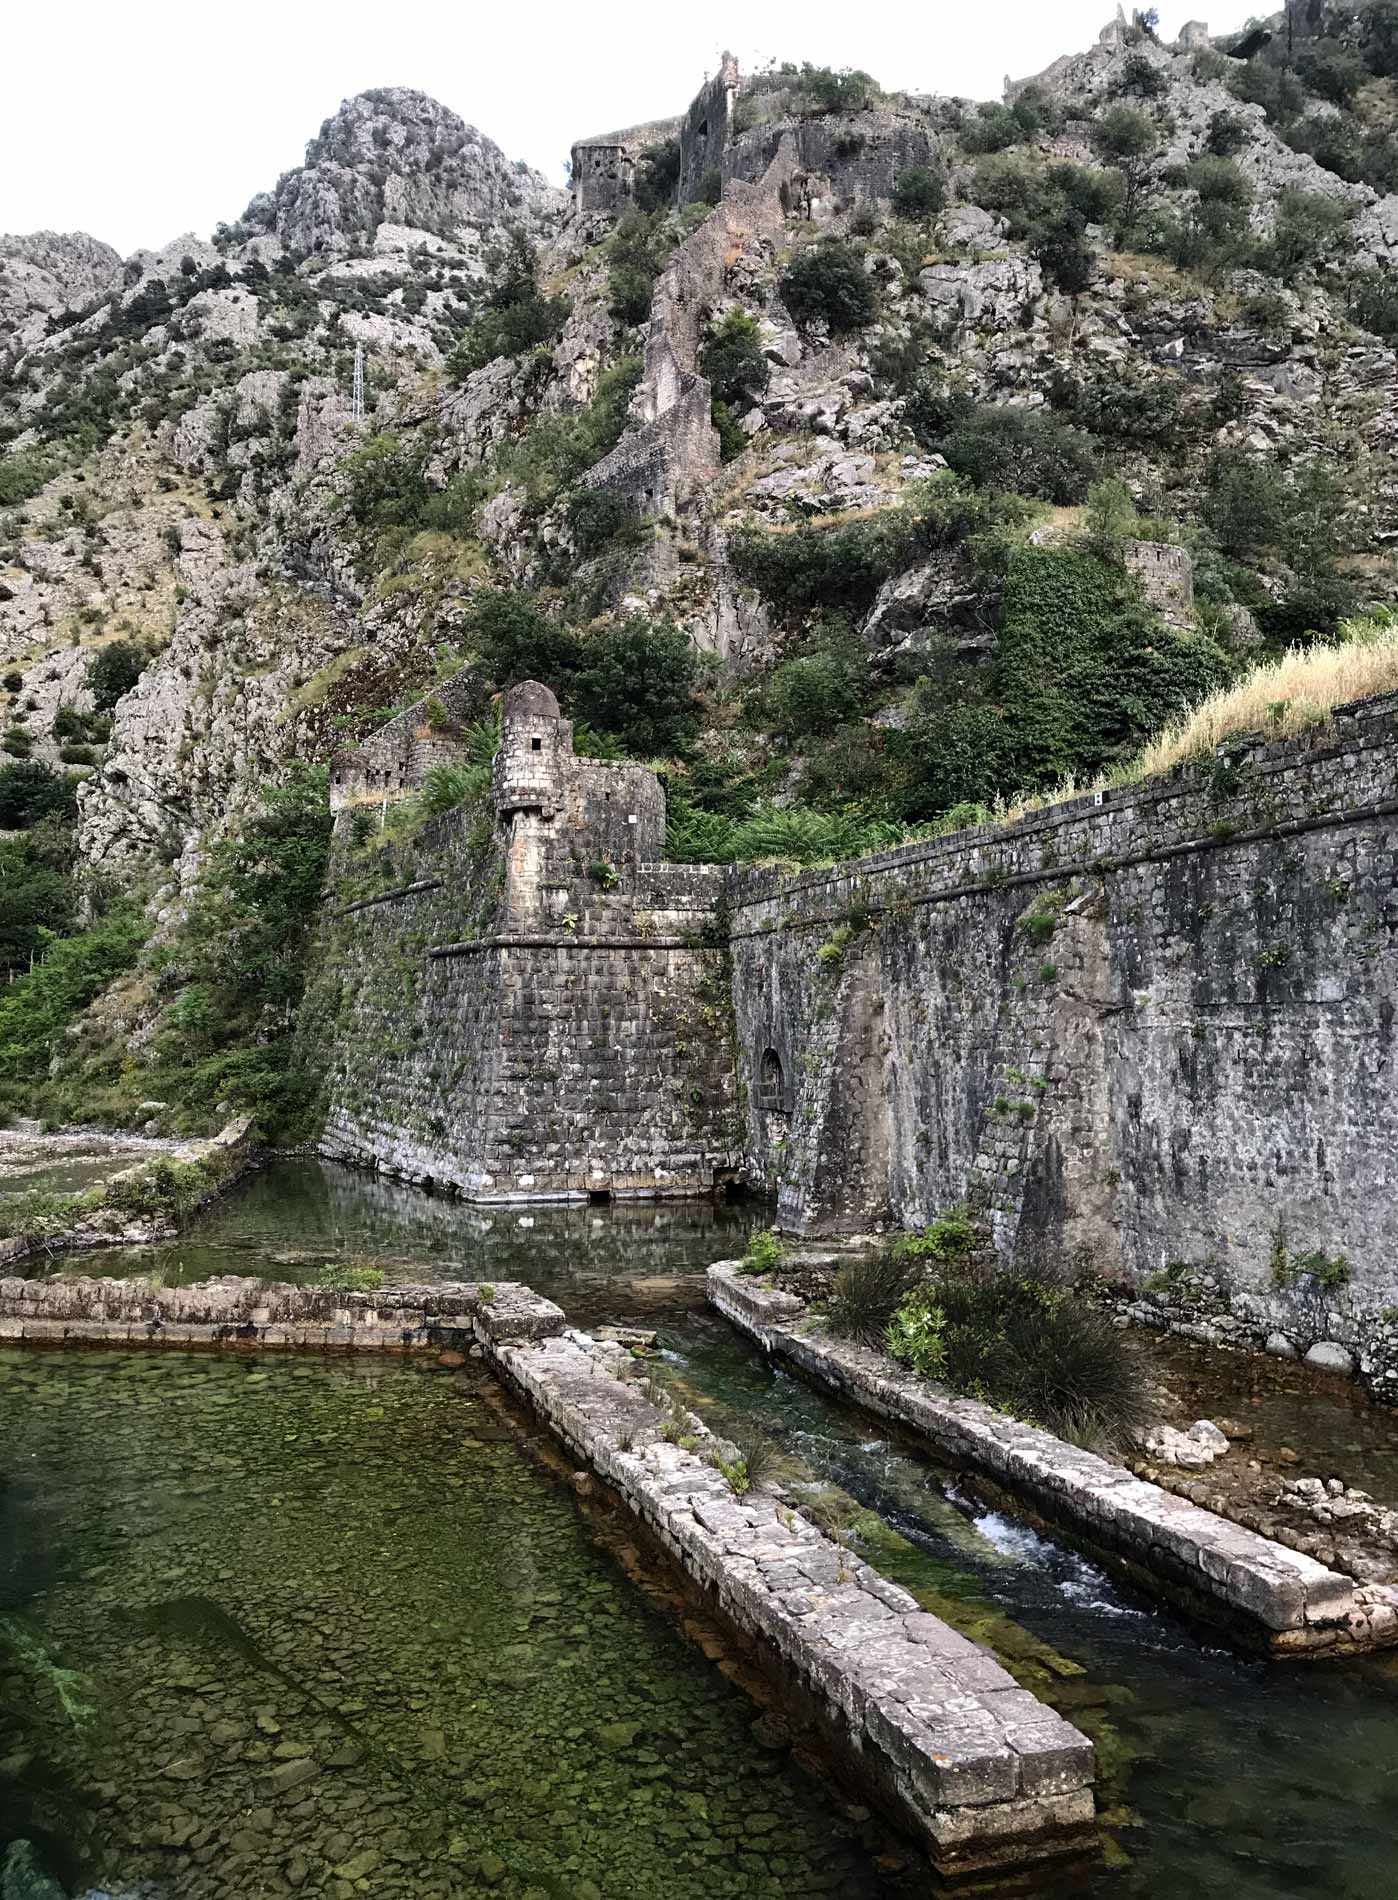 Kotor-Montenegro-Porta-Nord-fiume-Skurda-mura-veneziane-patrimonio-Unesco